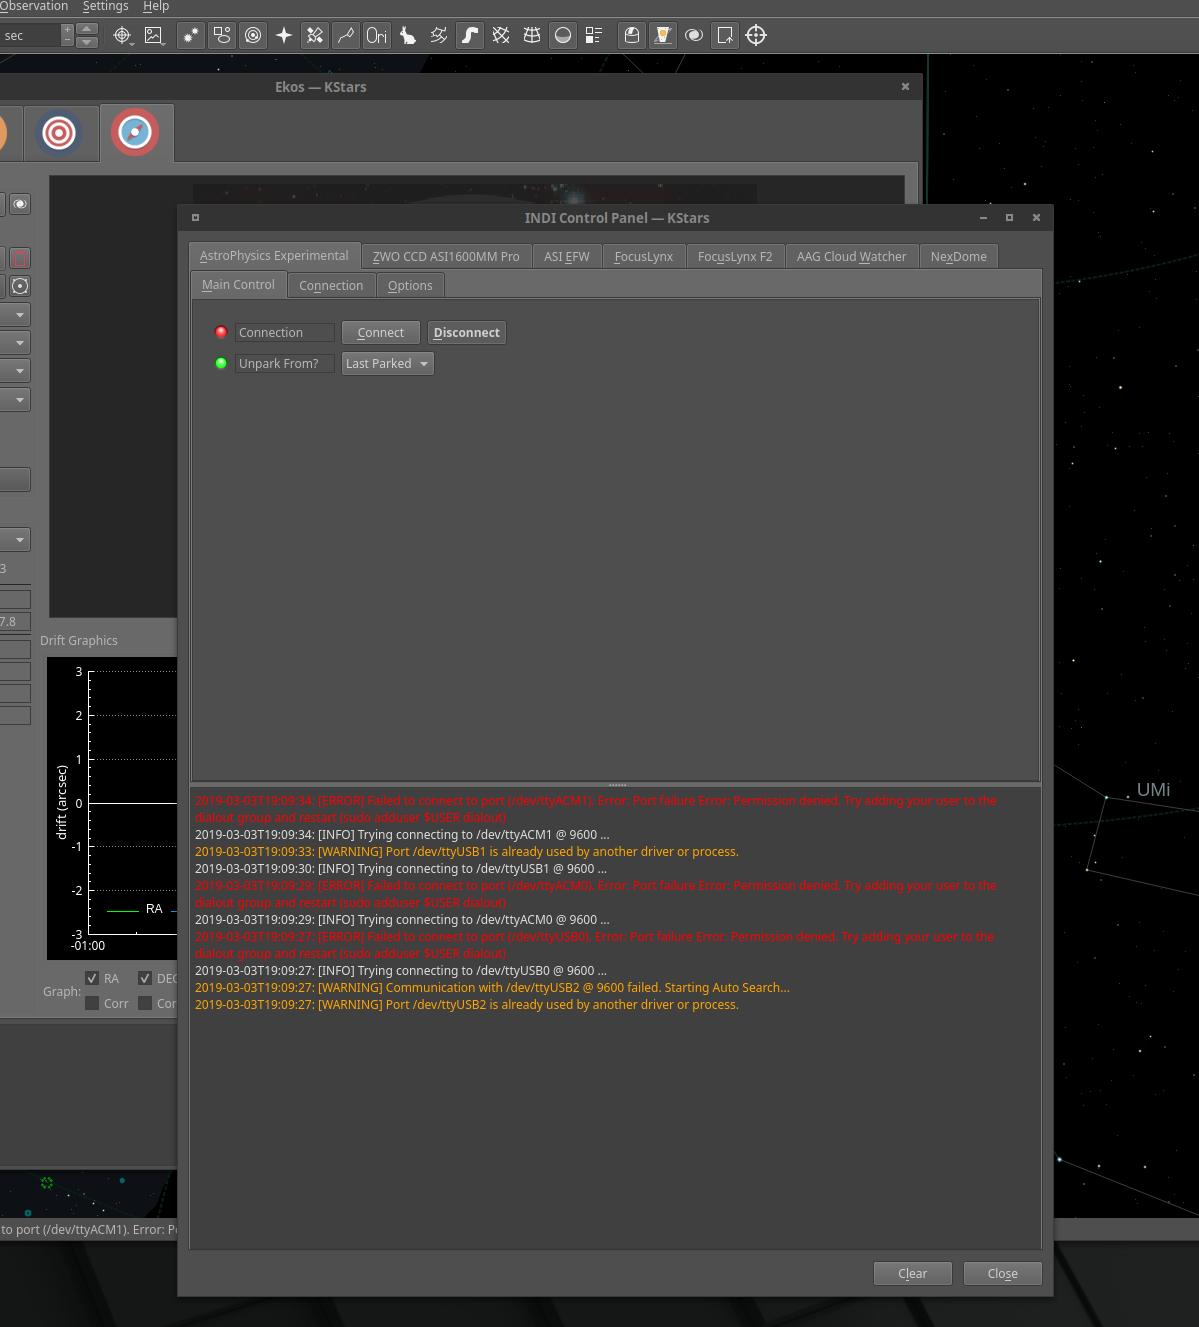 Screenshot2019-03-03141320.png